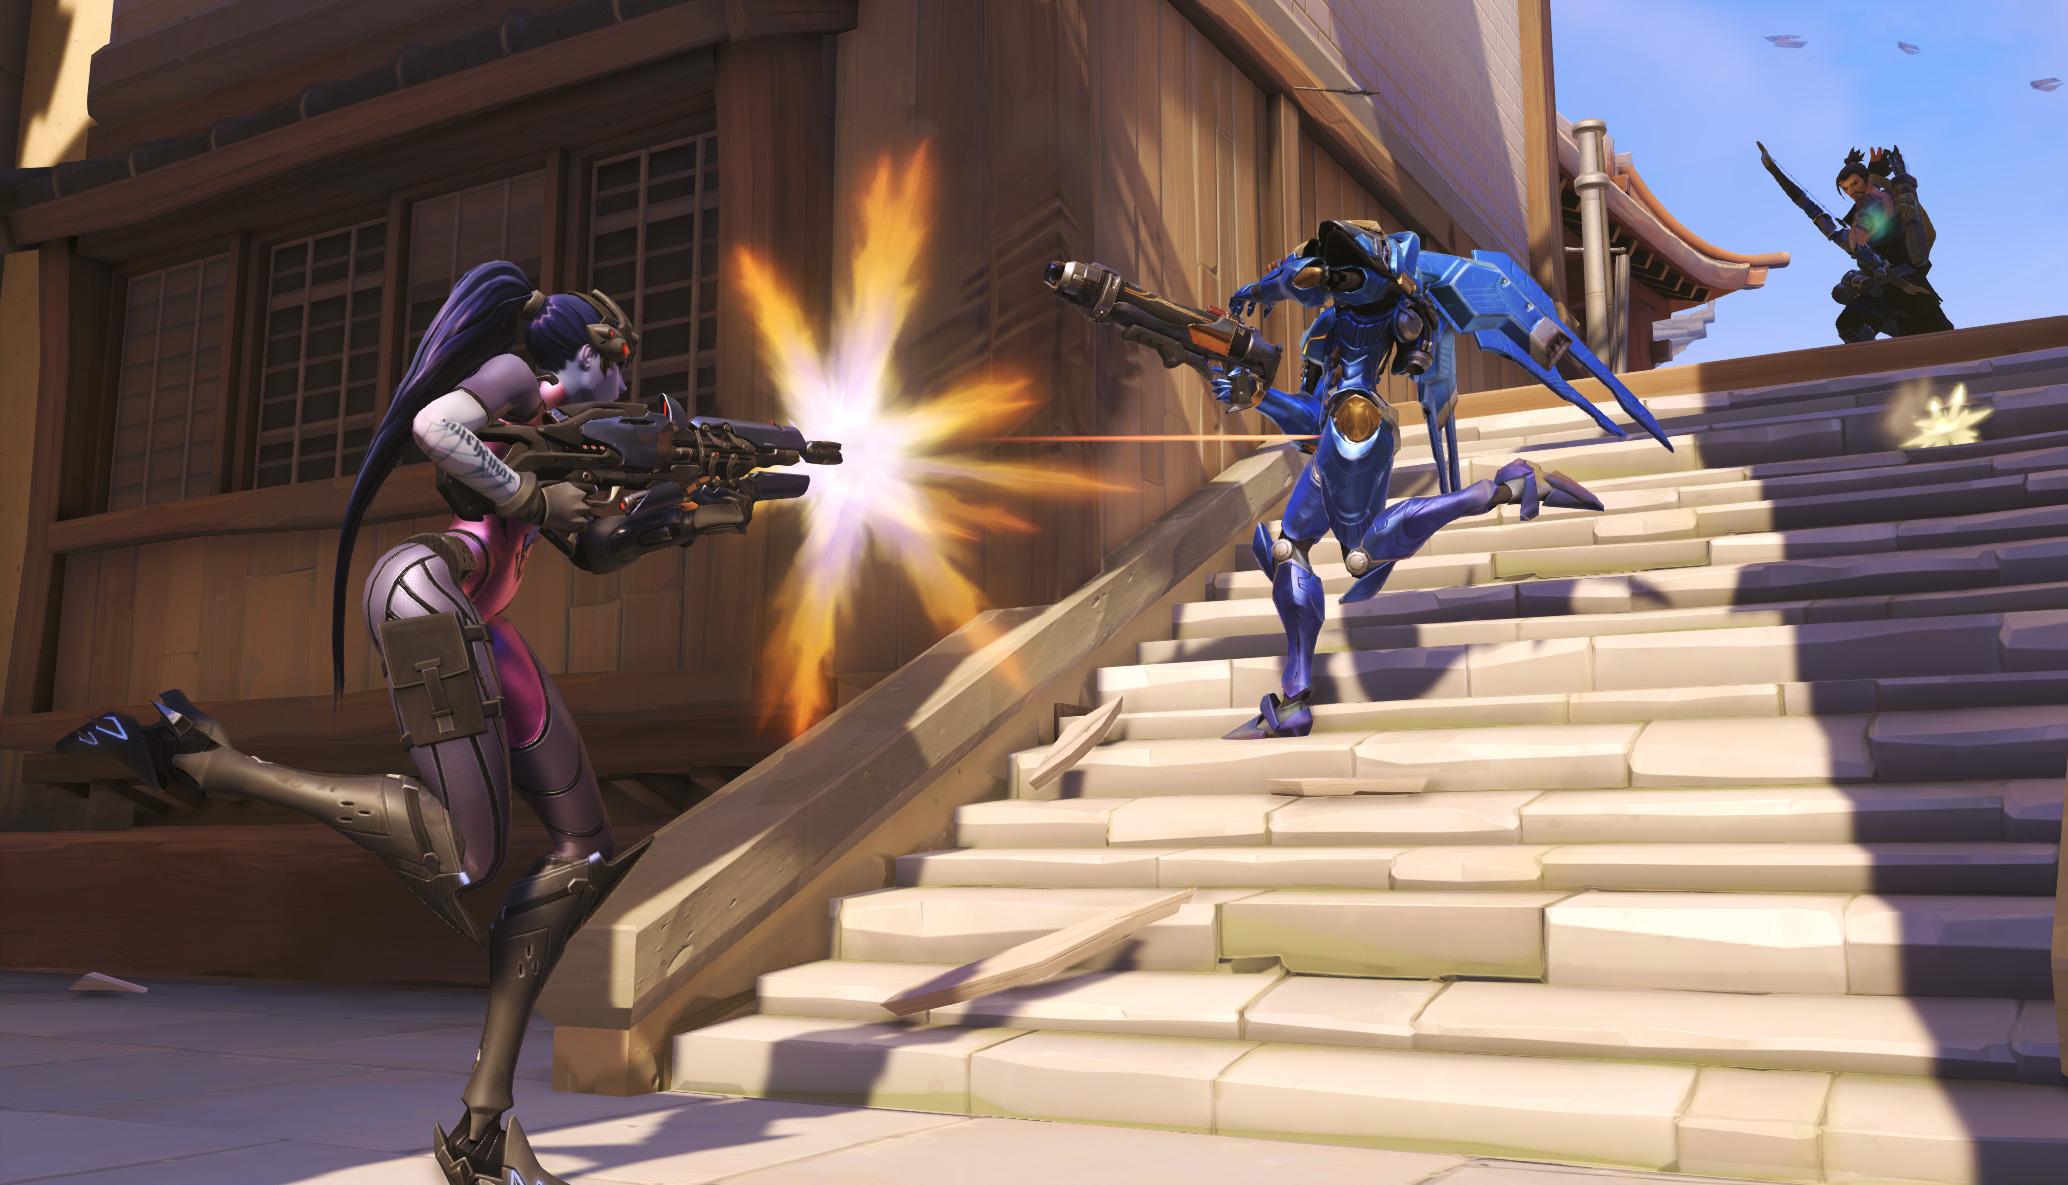 widowmaker screenshot 005 - KekRaptor: Blizzard to Further Rework Overwatch's Ana, Buffs Incoming